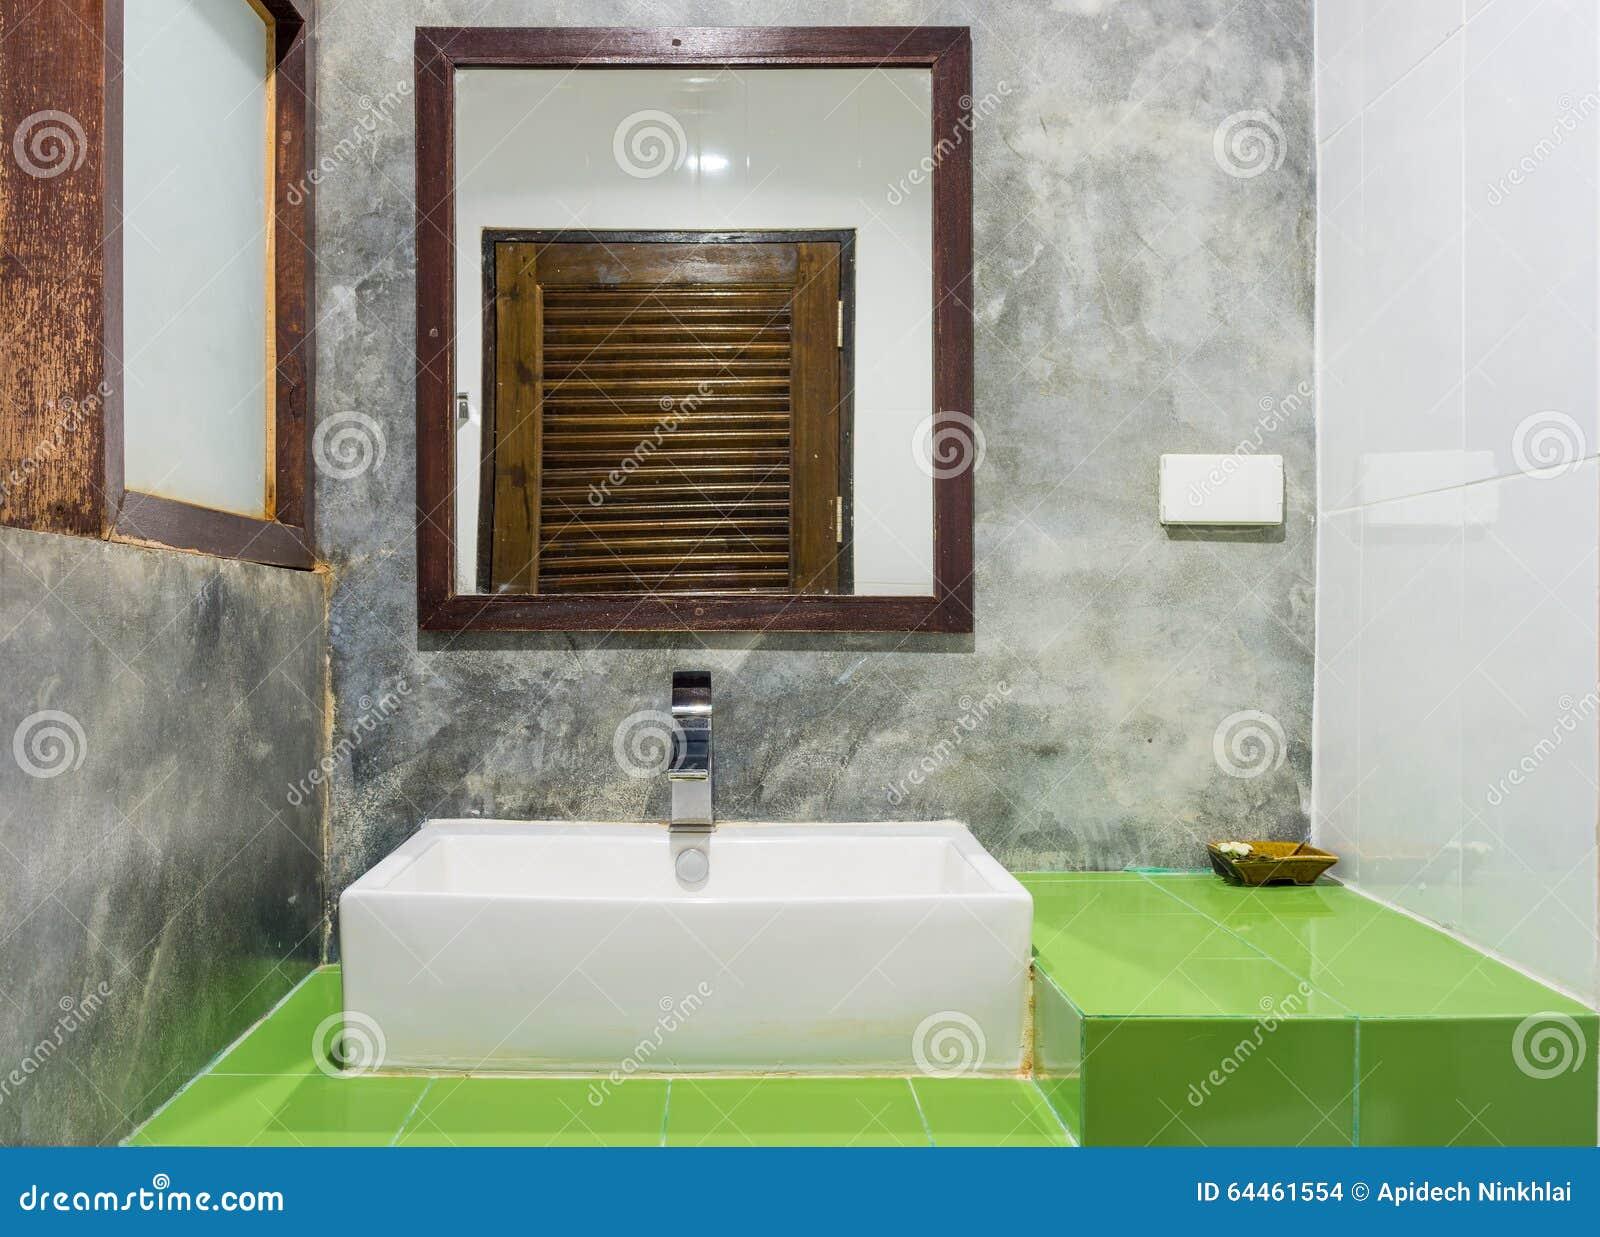 Royalty Free Stock Photo  Download Ceramic Washbasin. Ceramic Washbasin  Bowl And Mirror On Green Ceramic Tiles Counter